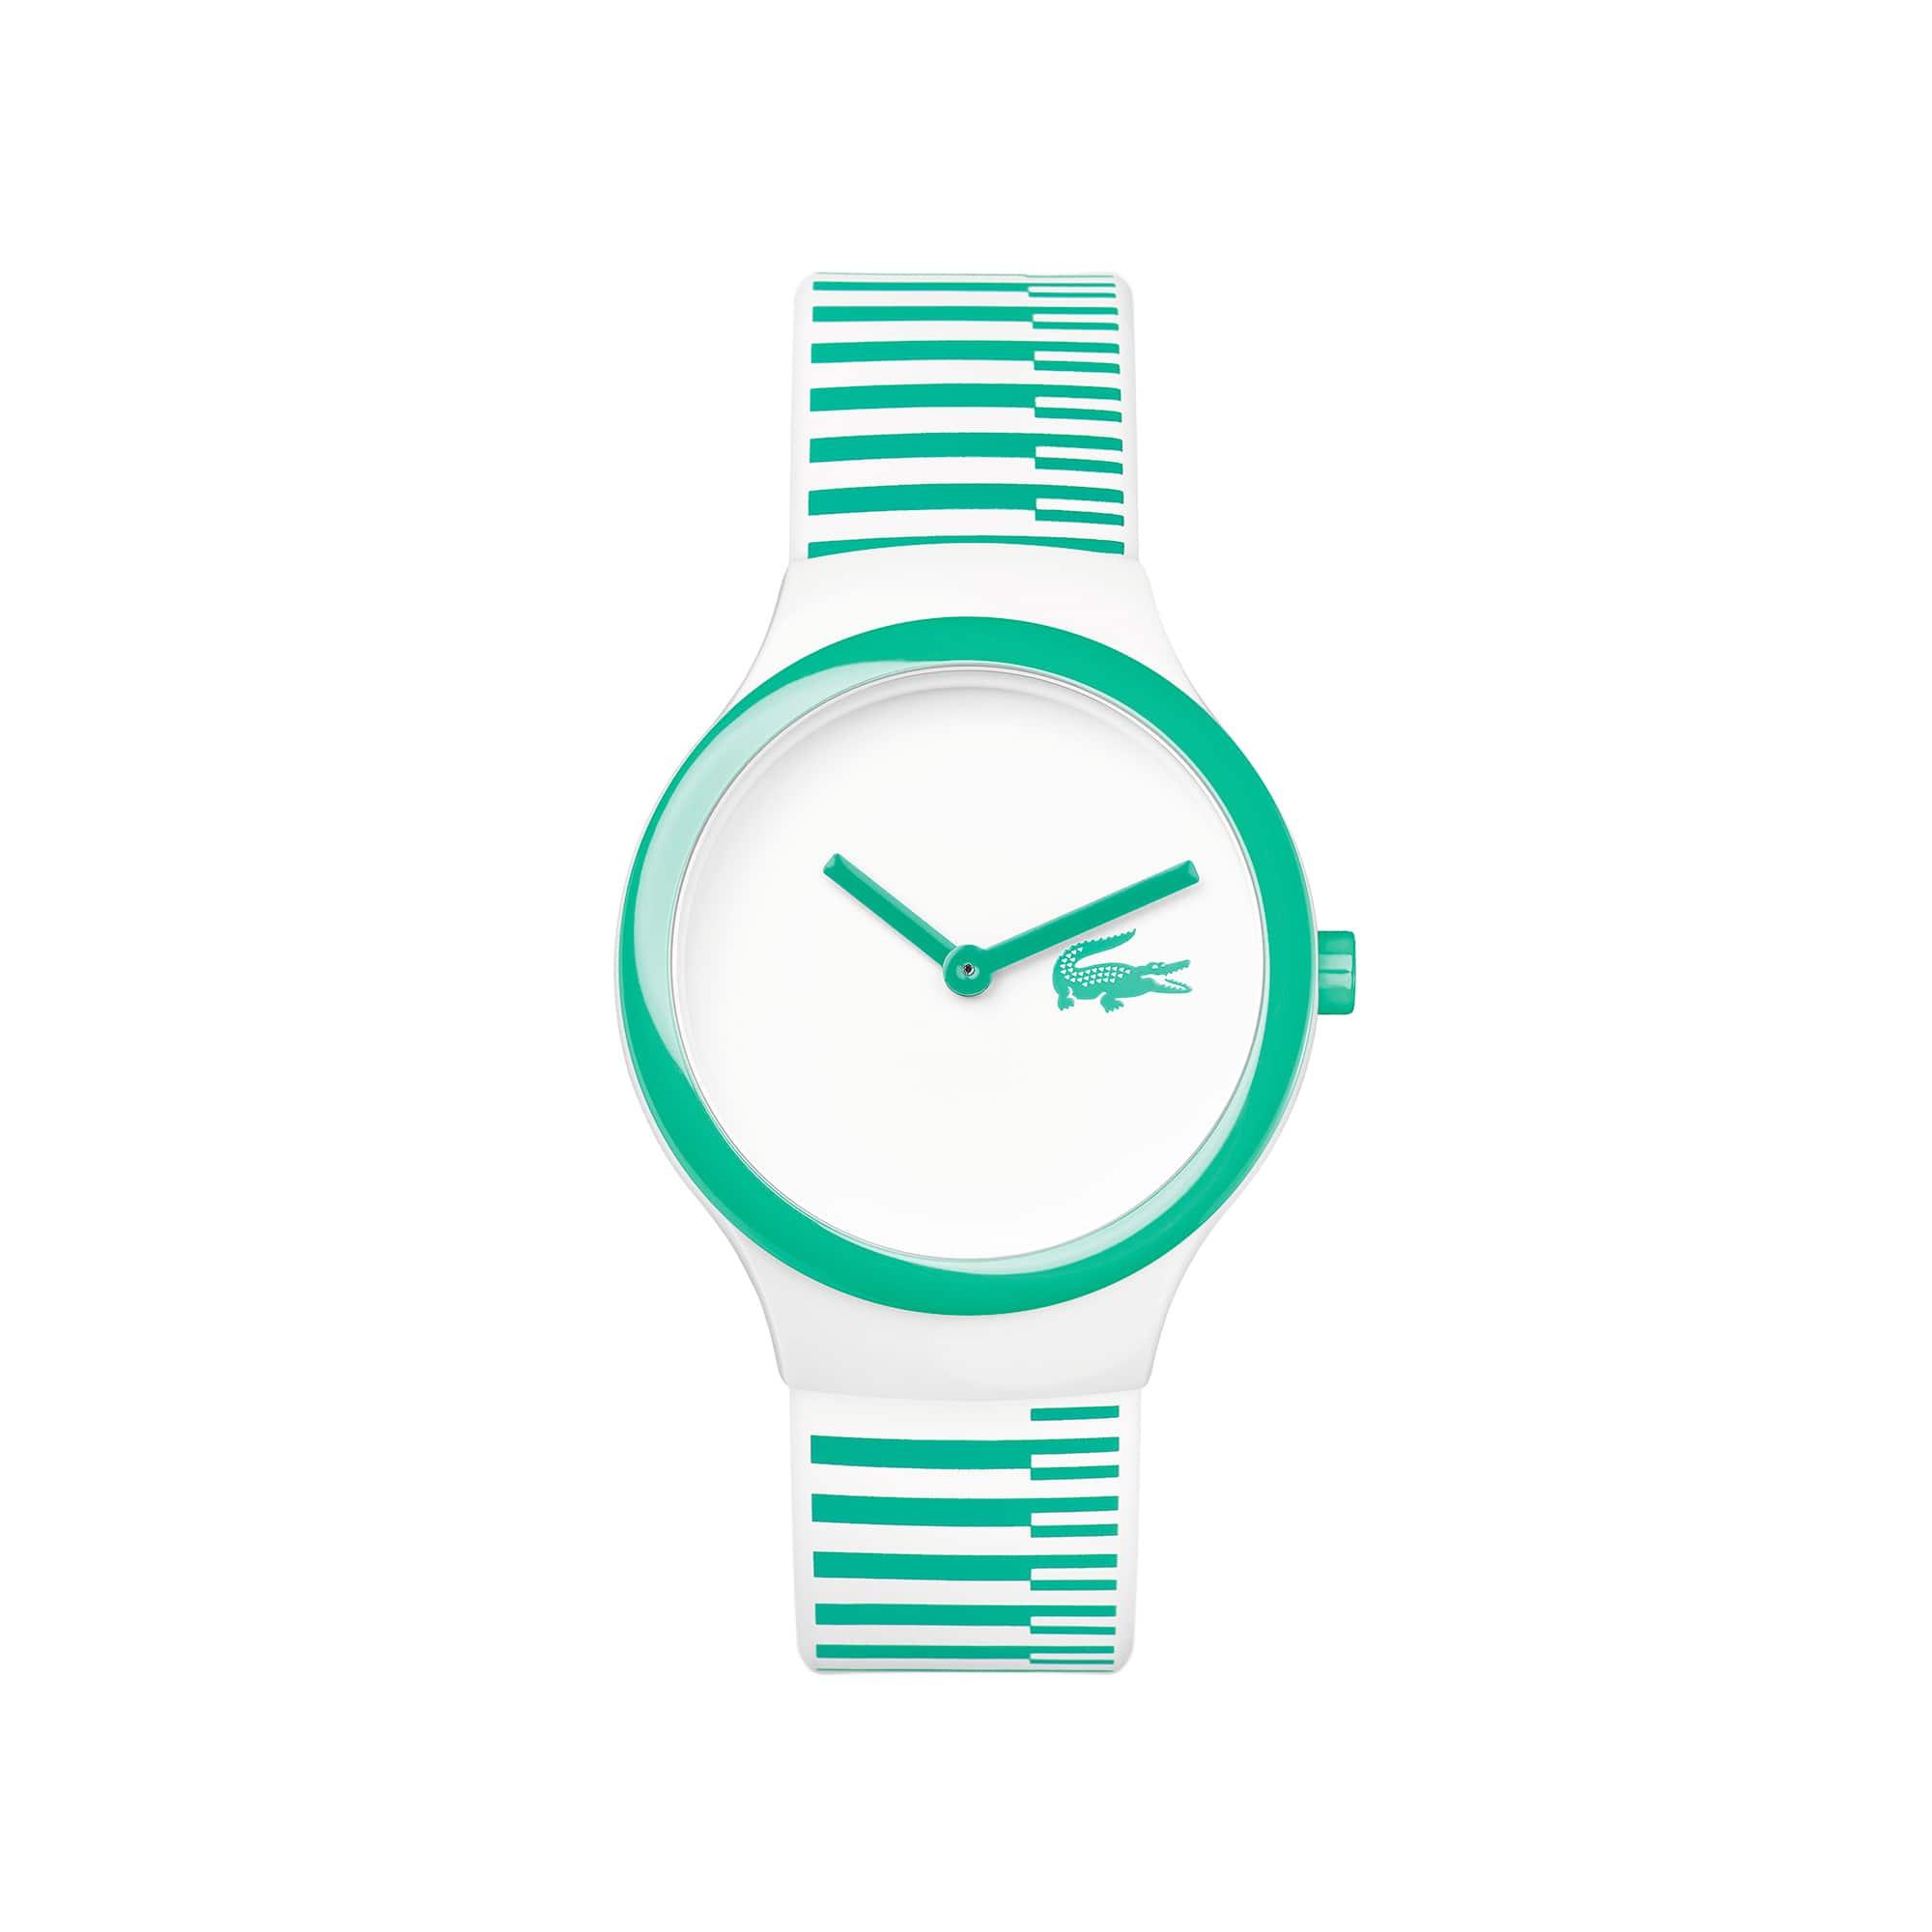 Orologio Goa NEW Bianco Righe verdi